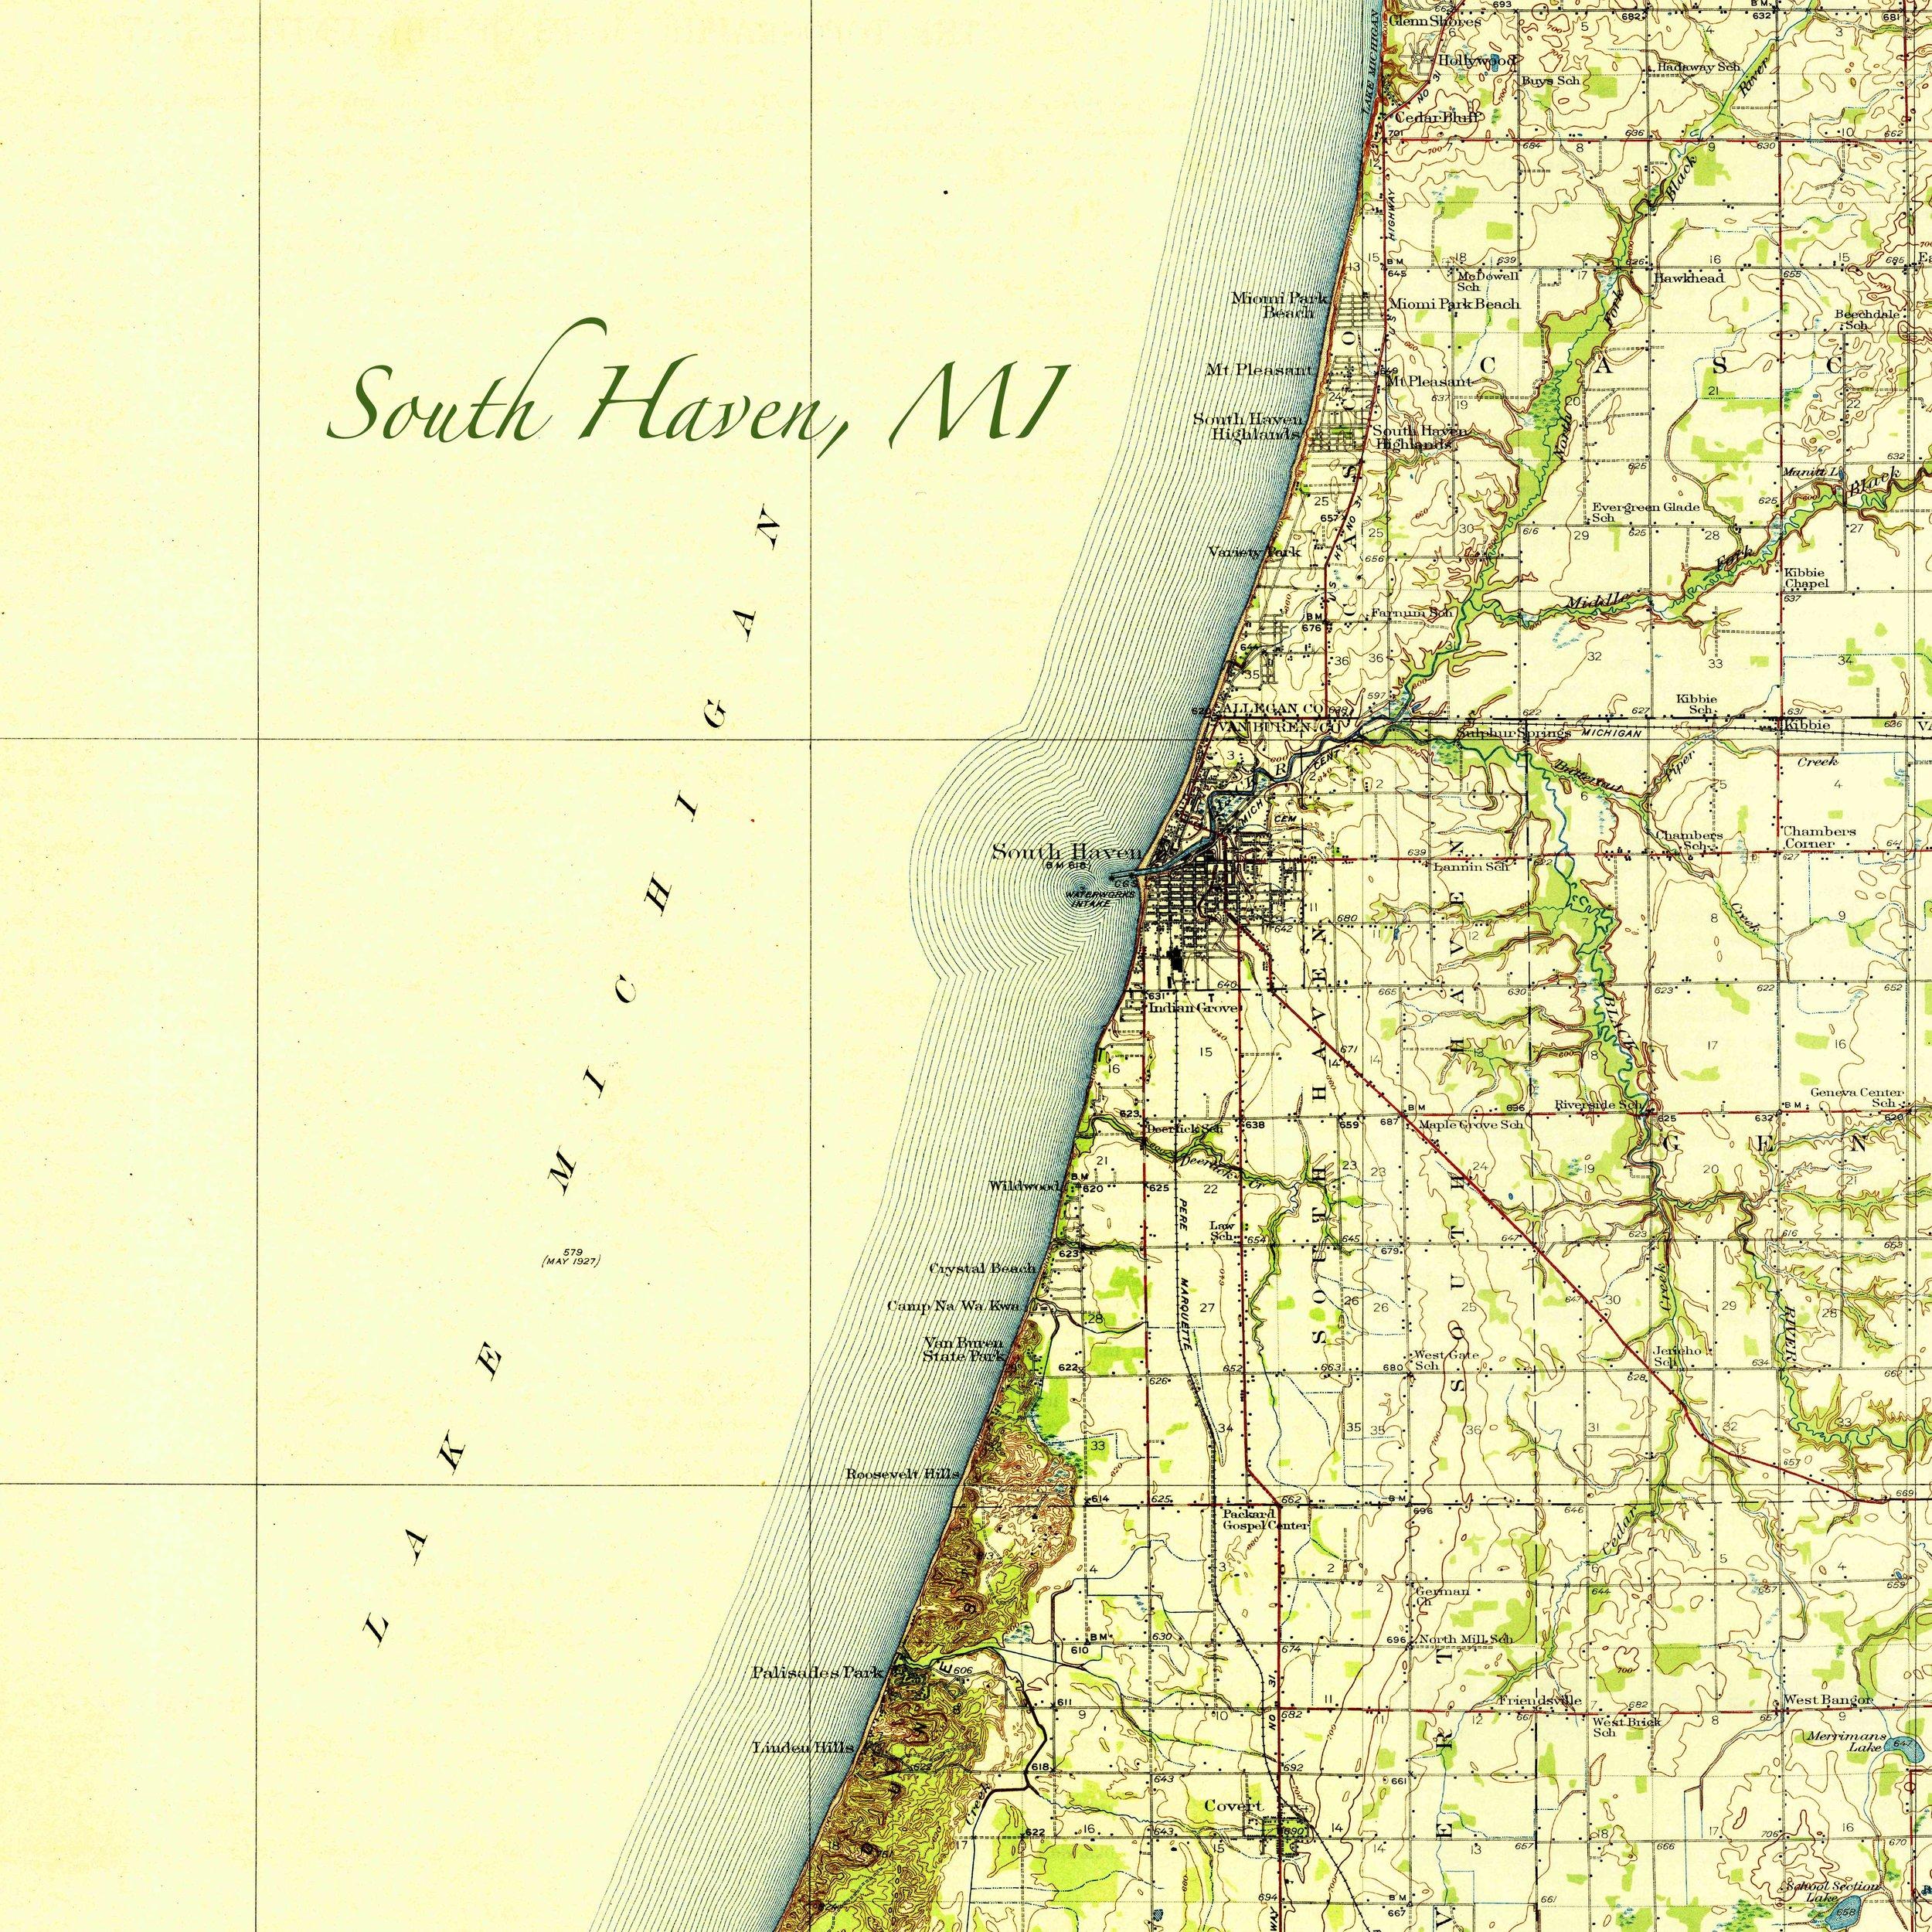 AB2810-GCO south haven SC.jpg